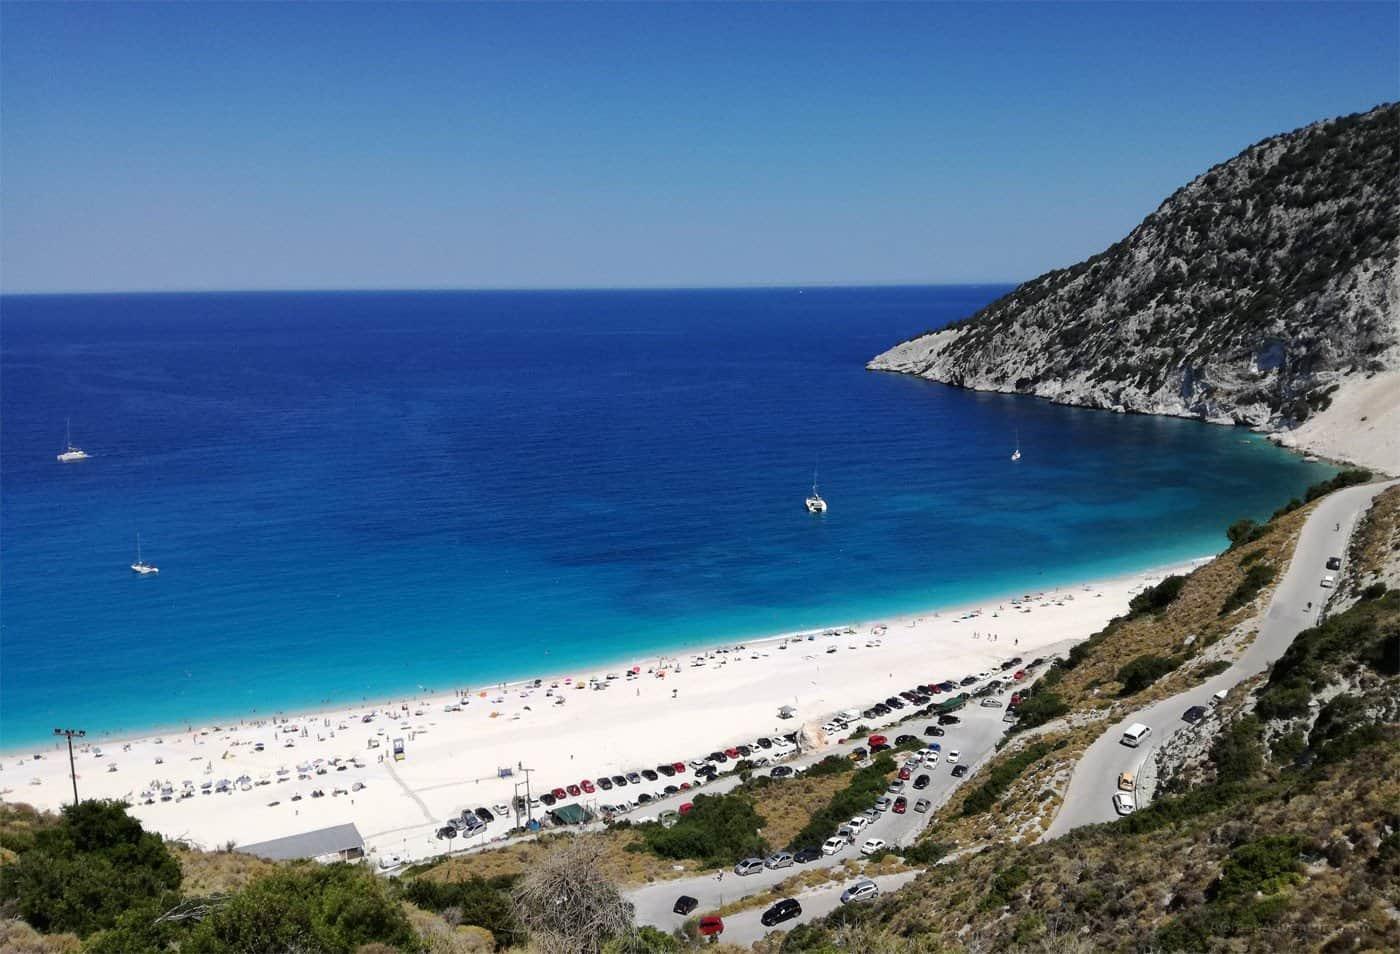 Things To Do In Kefalonia Holidays Greece Agreekadventure World Travel Blog